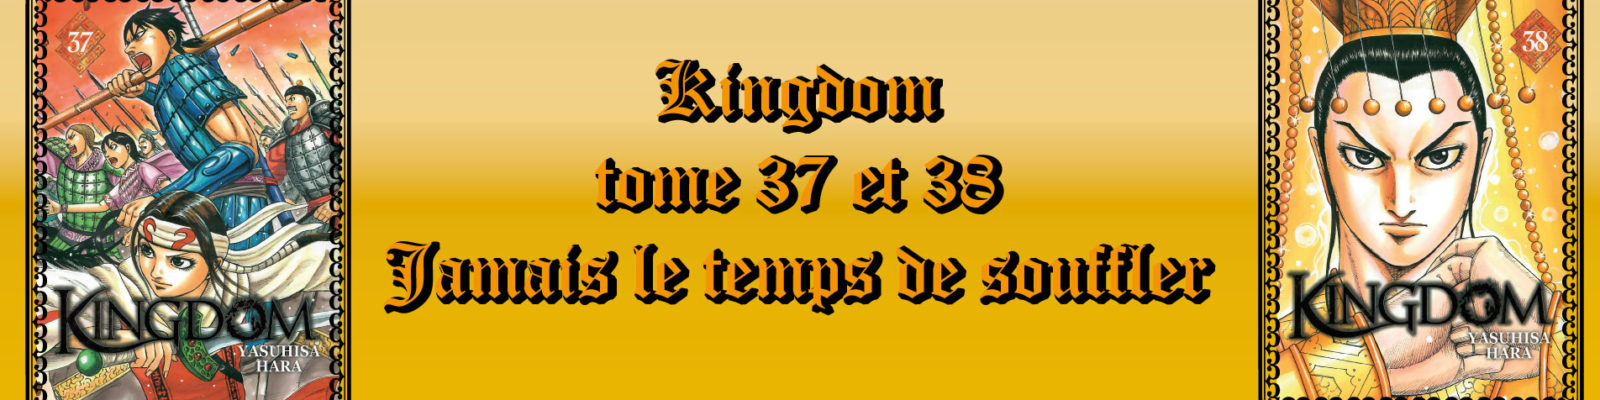 kingdom-37-38